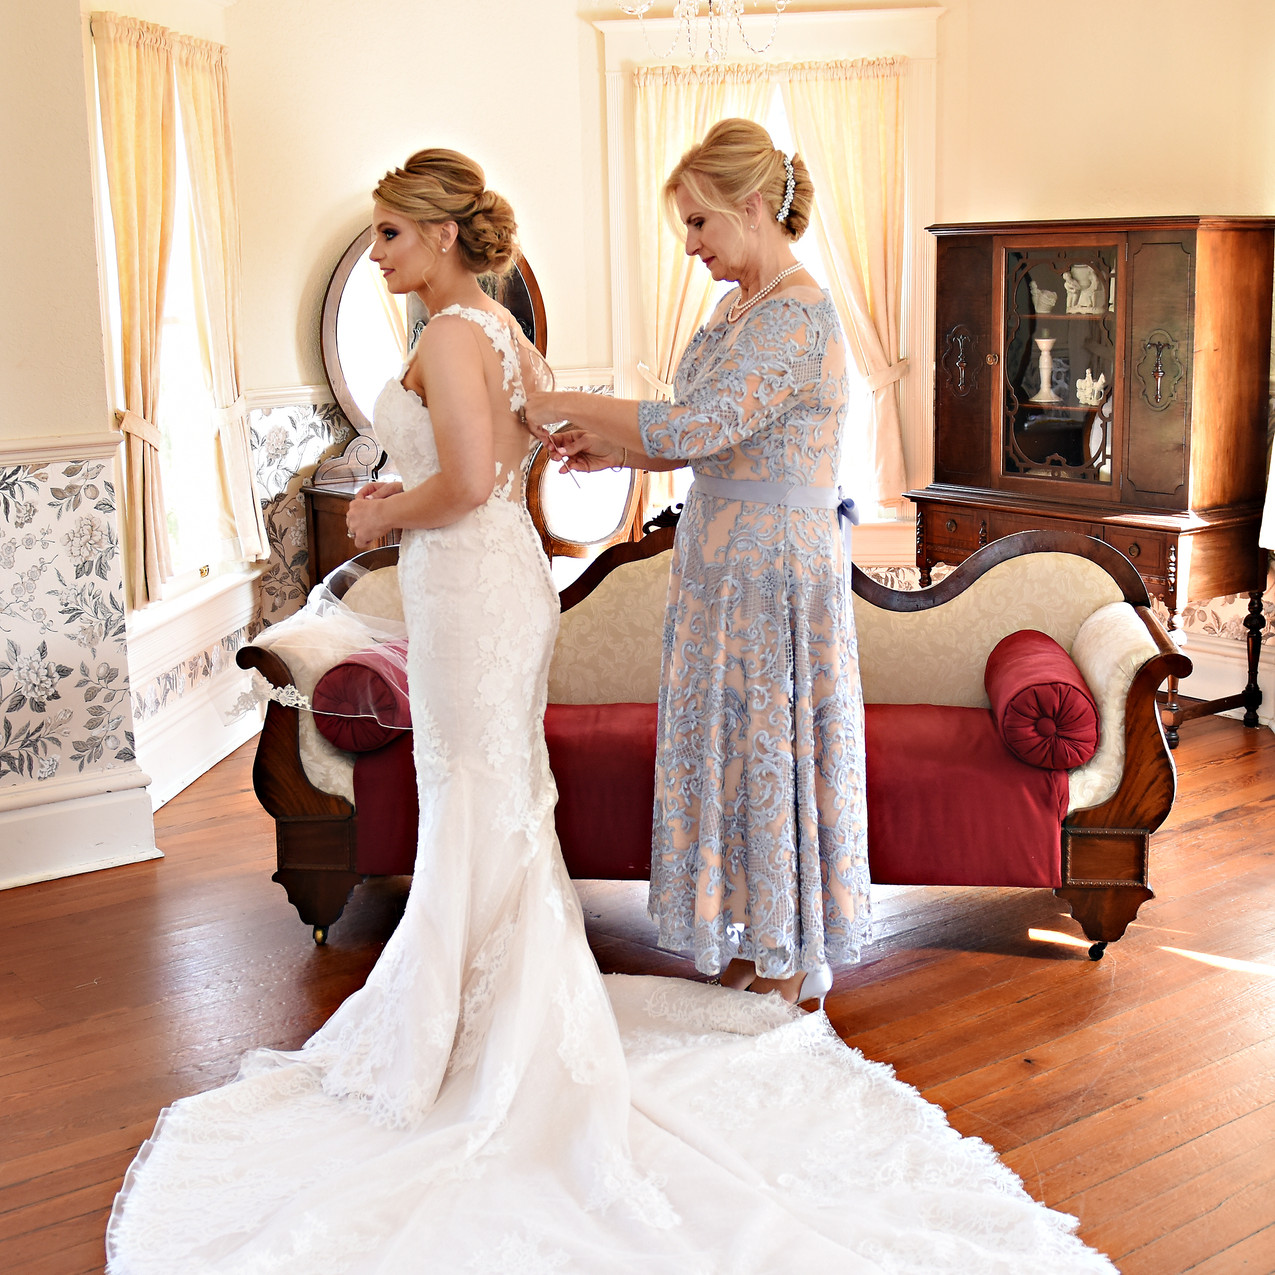 Mom assisting the bride